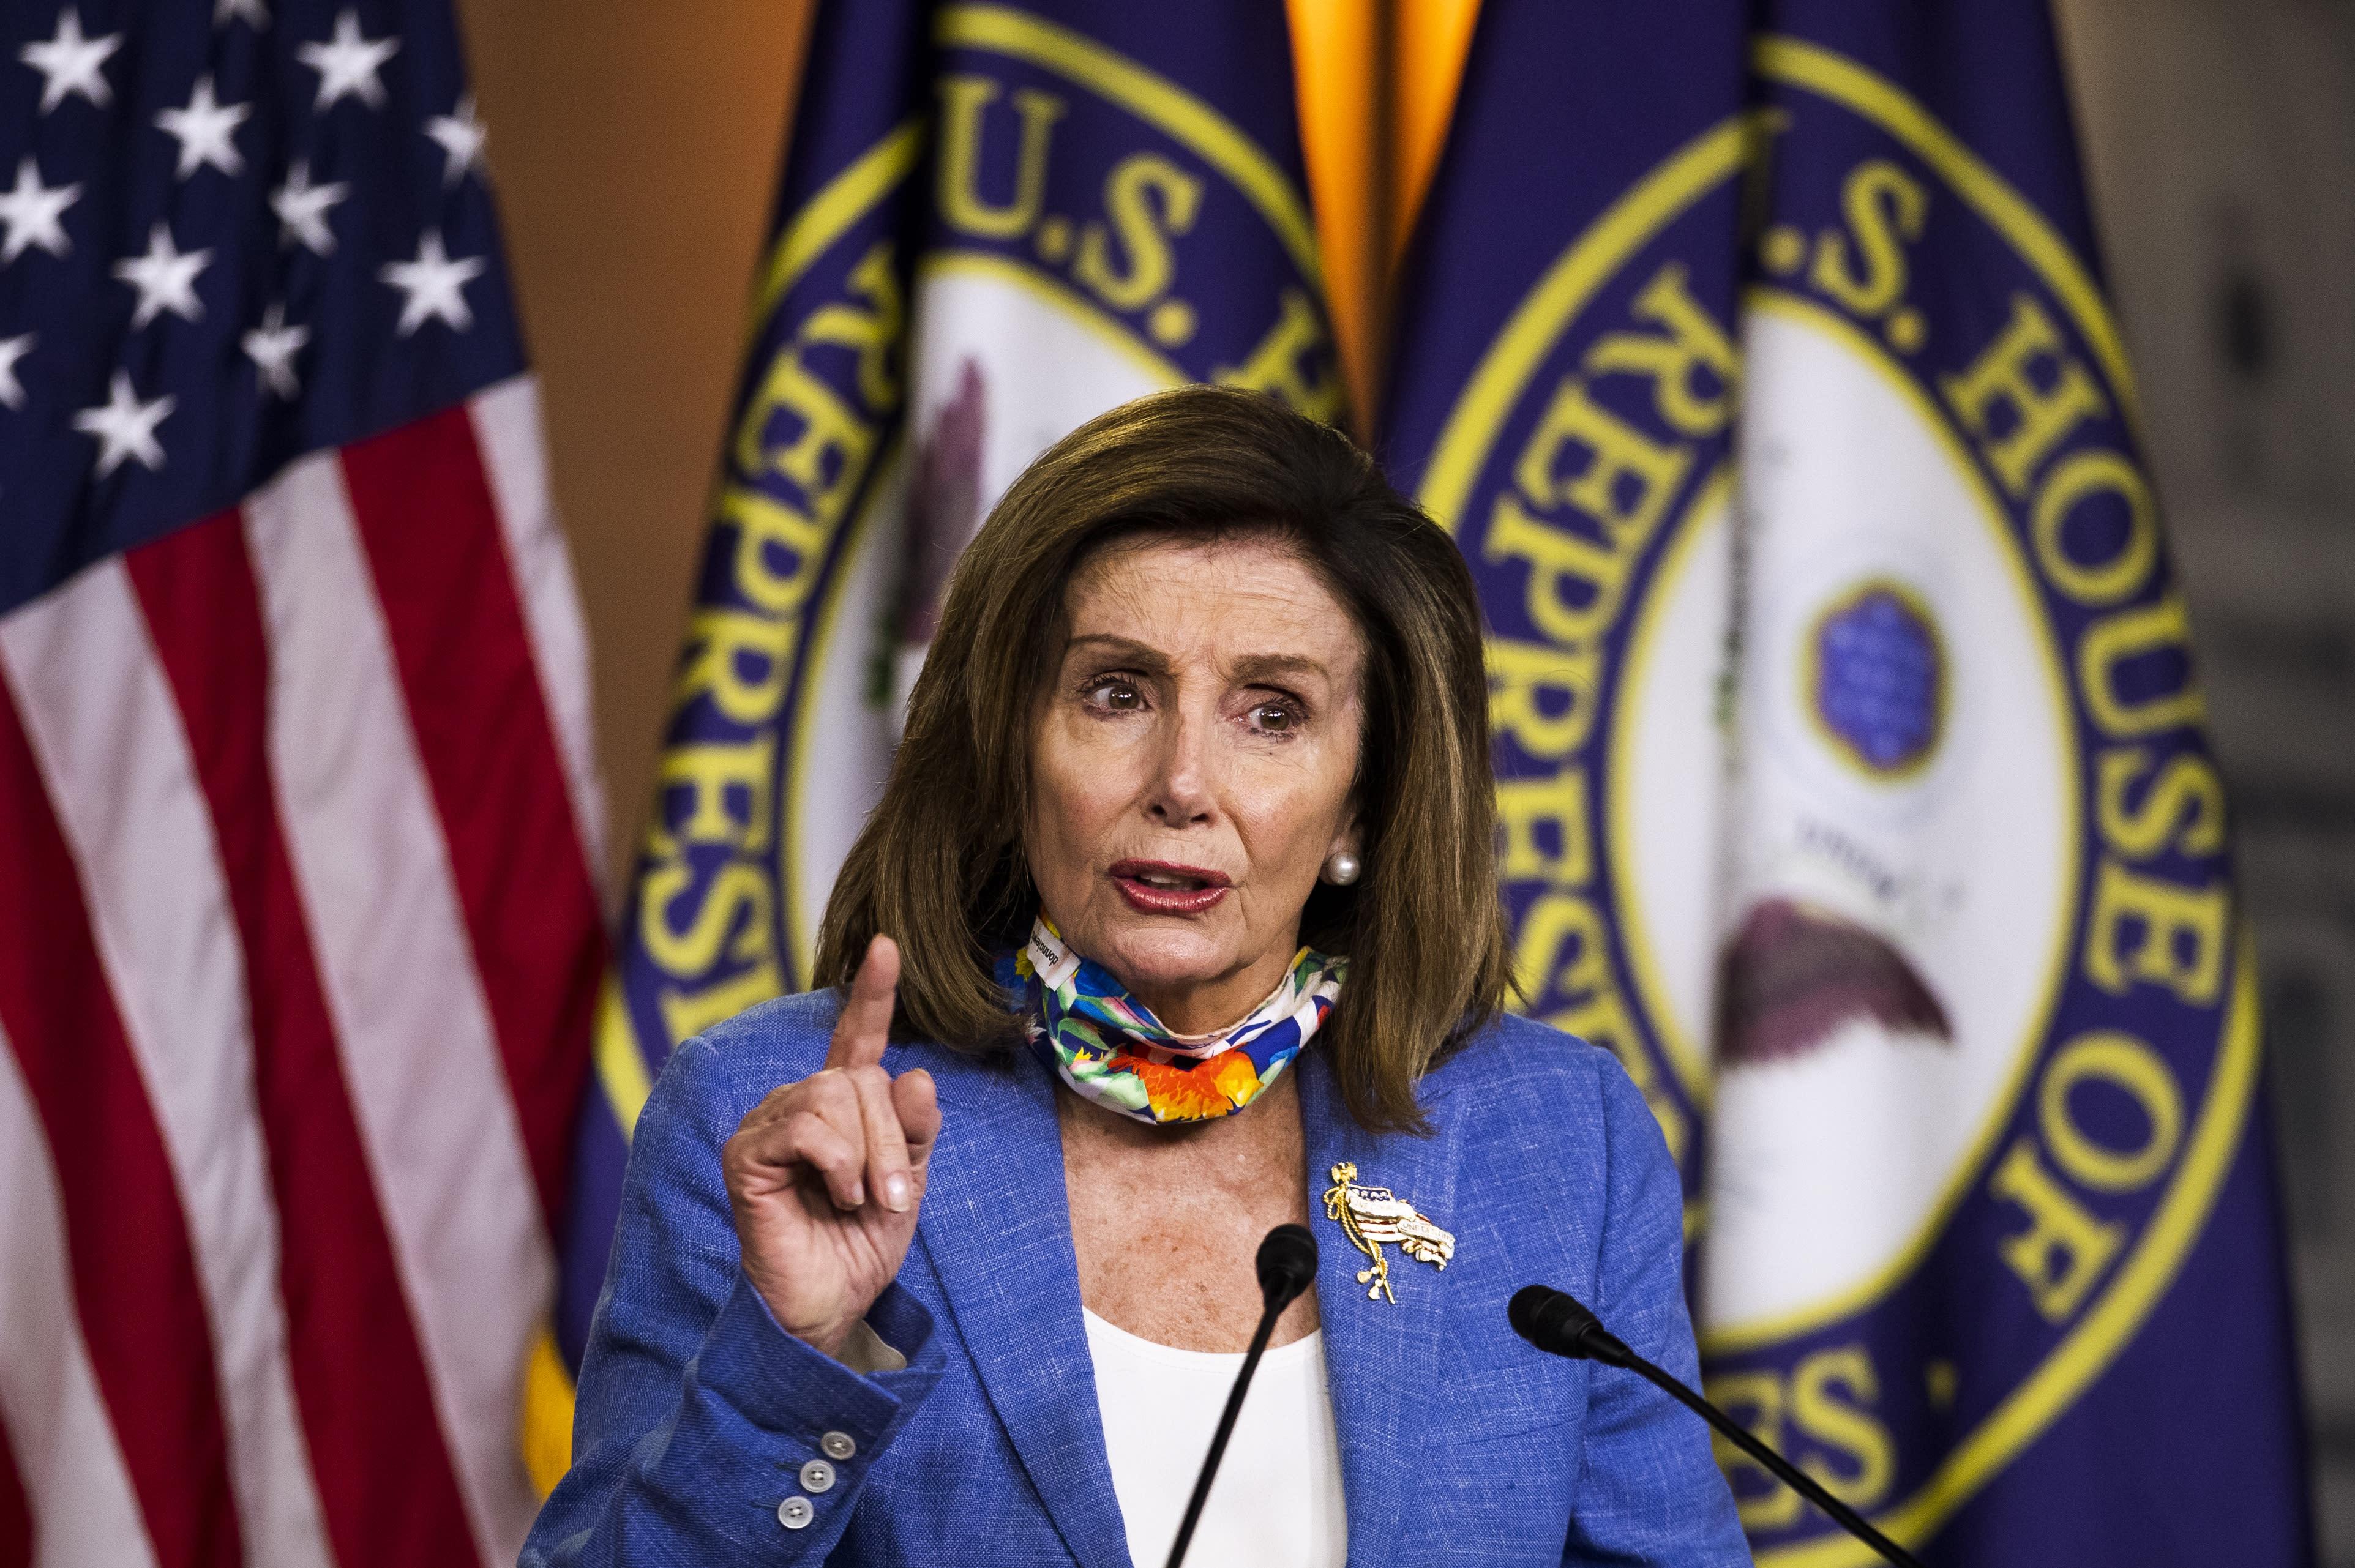 House Speaker Nancy Pelosi of Calif., speaks during a news conference on Capitol Hill, Thursday, July 2, 2020, in Washington. (AP Photo/Manuel Balce Ceneta)